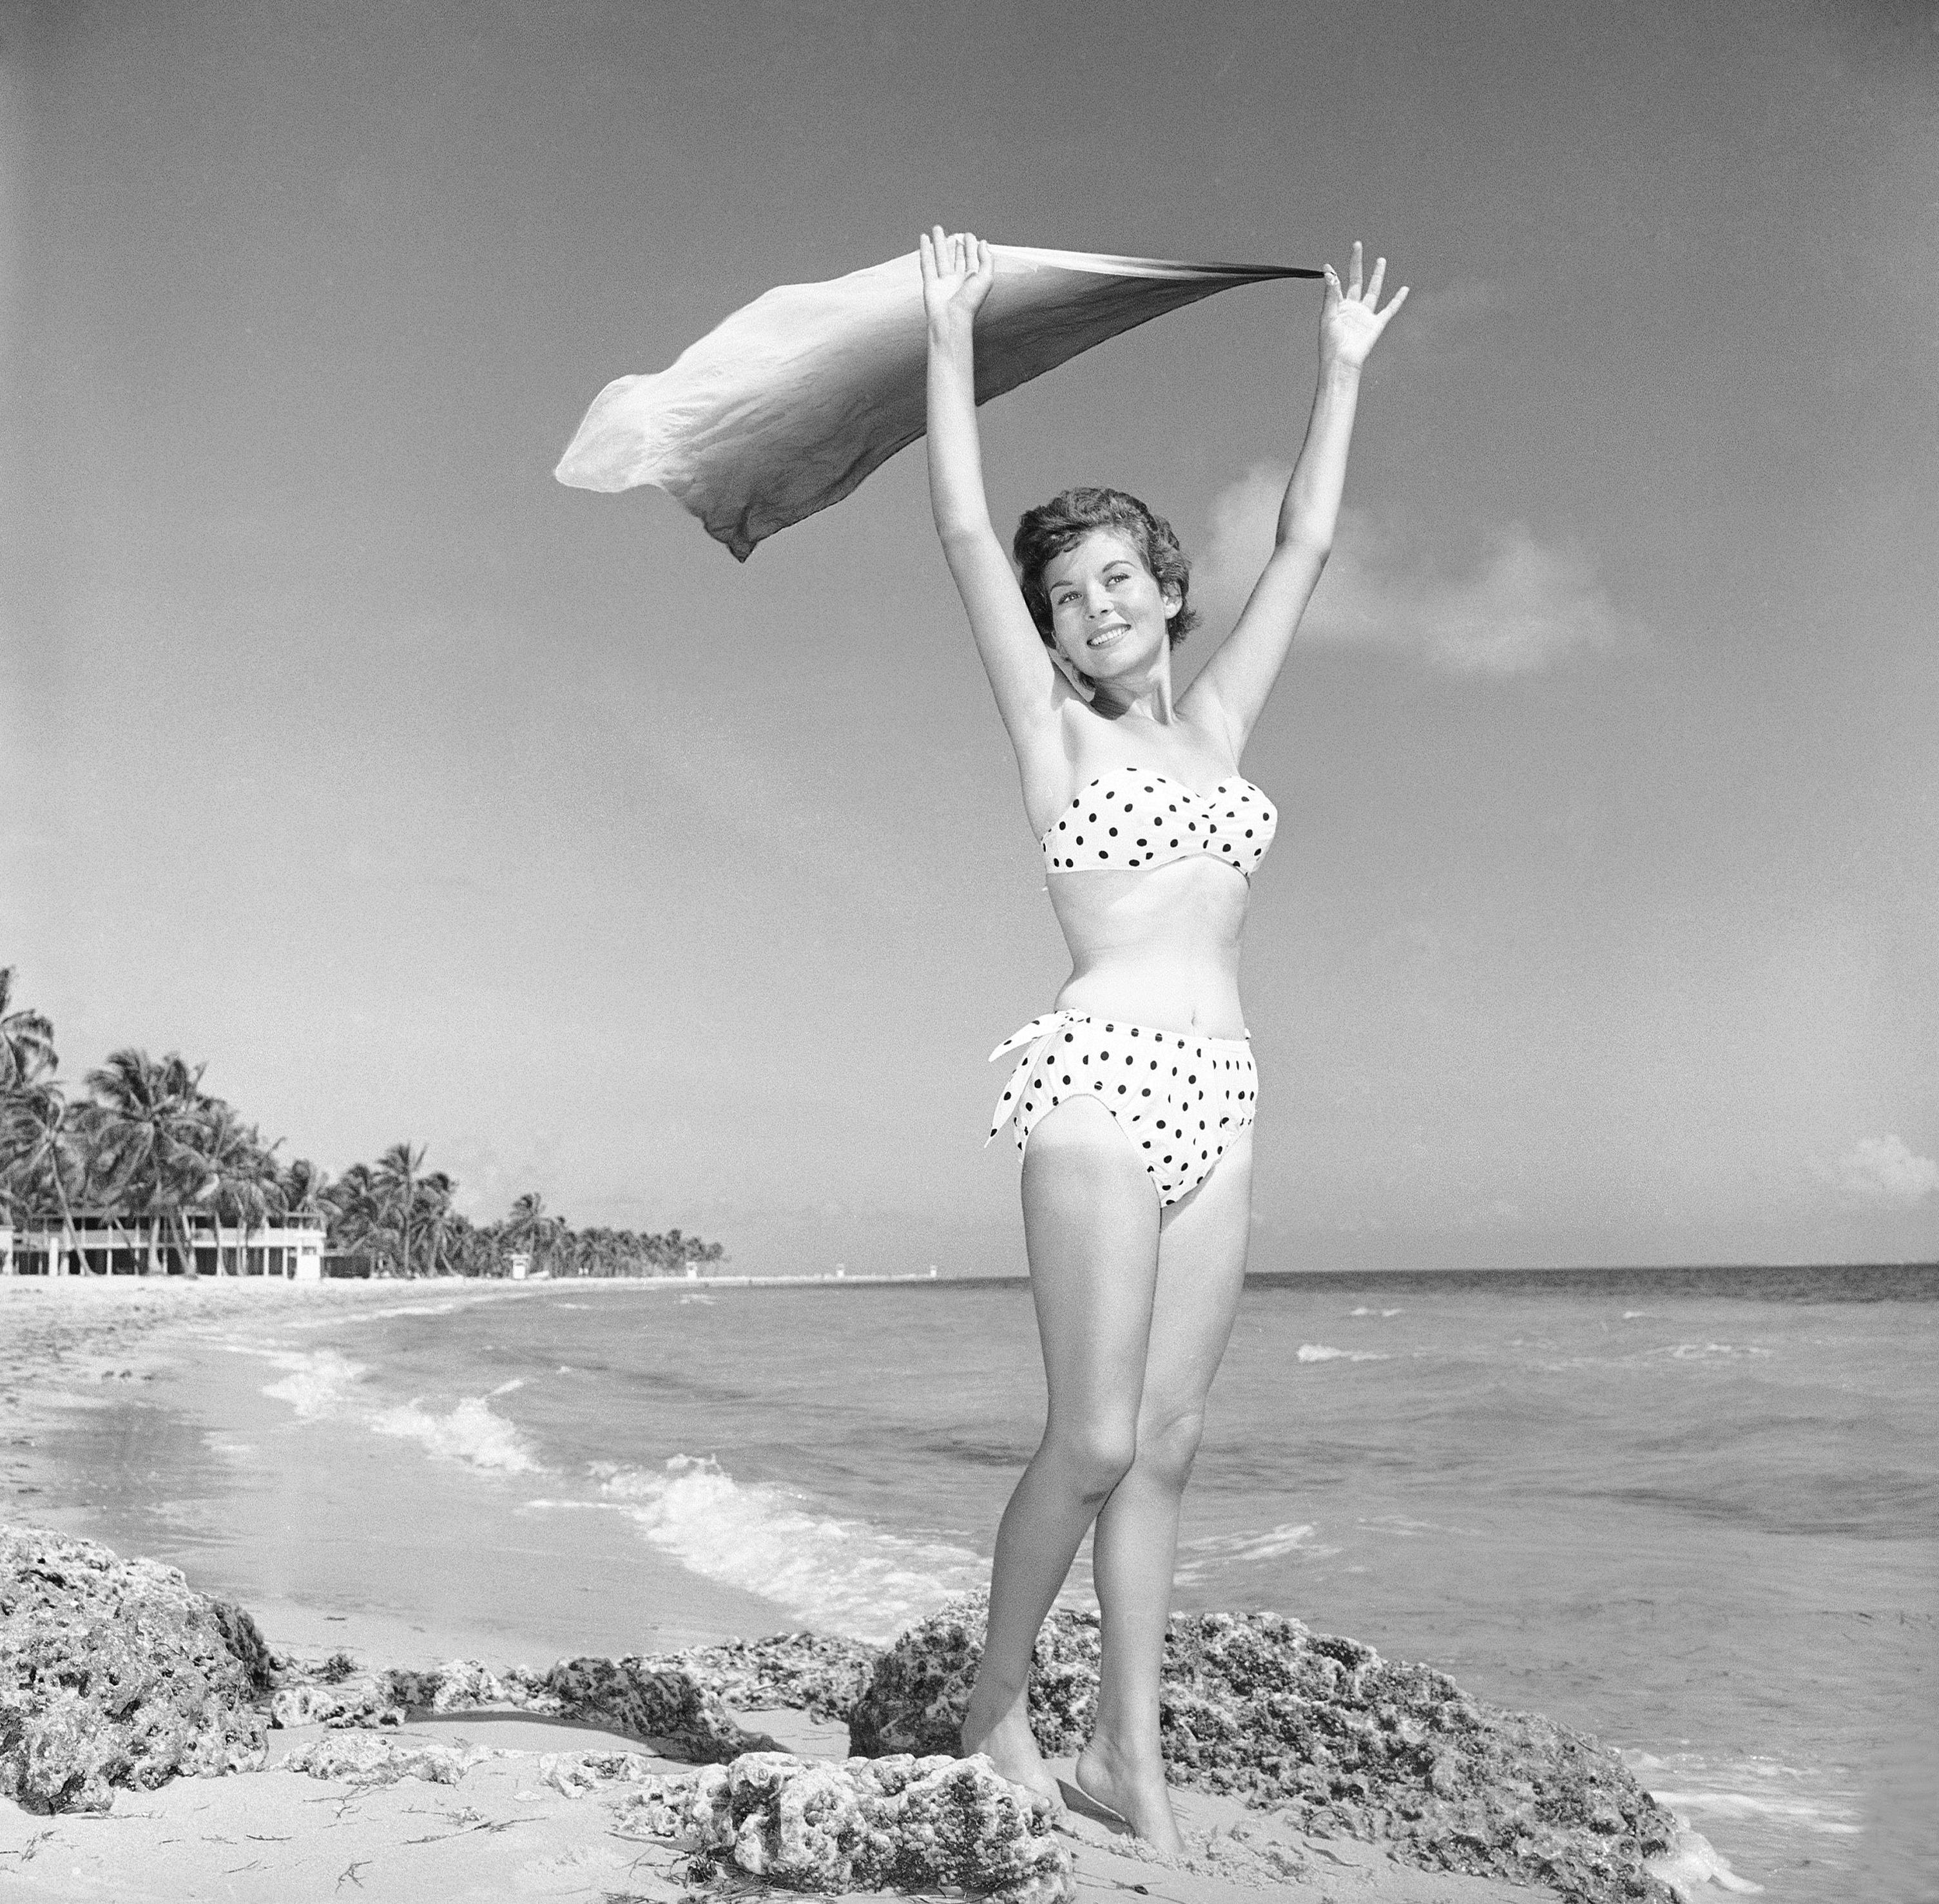 848f8e46059 Victoria s Secret is rebooting swimwear. Here s how it should do it ...